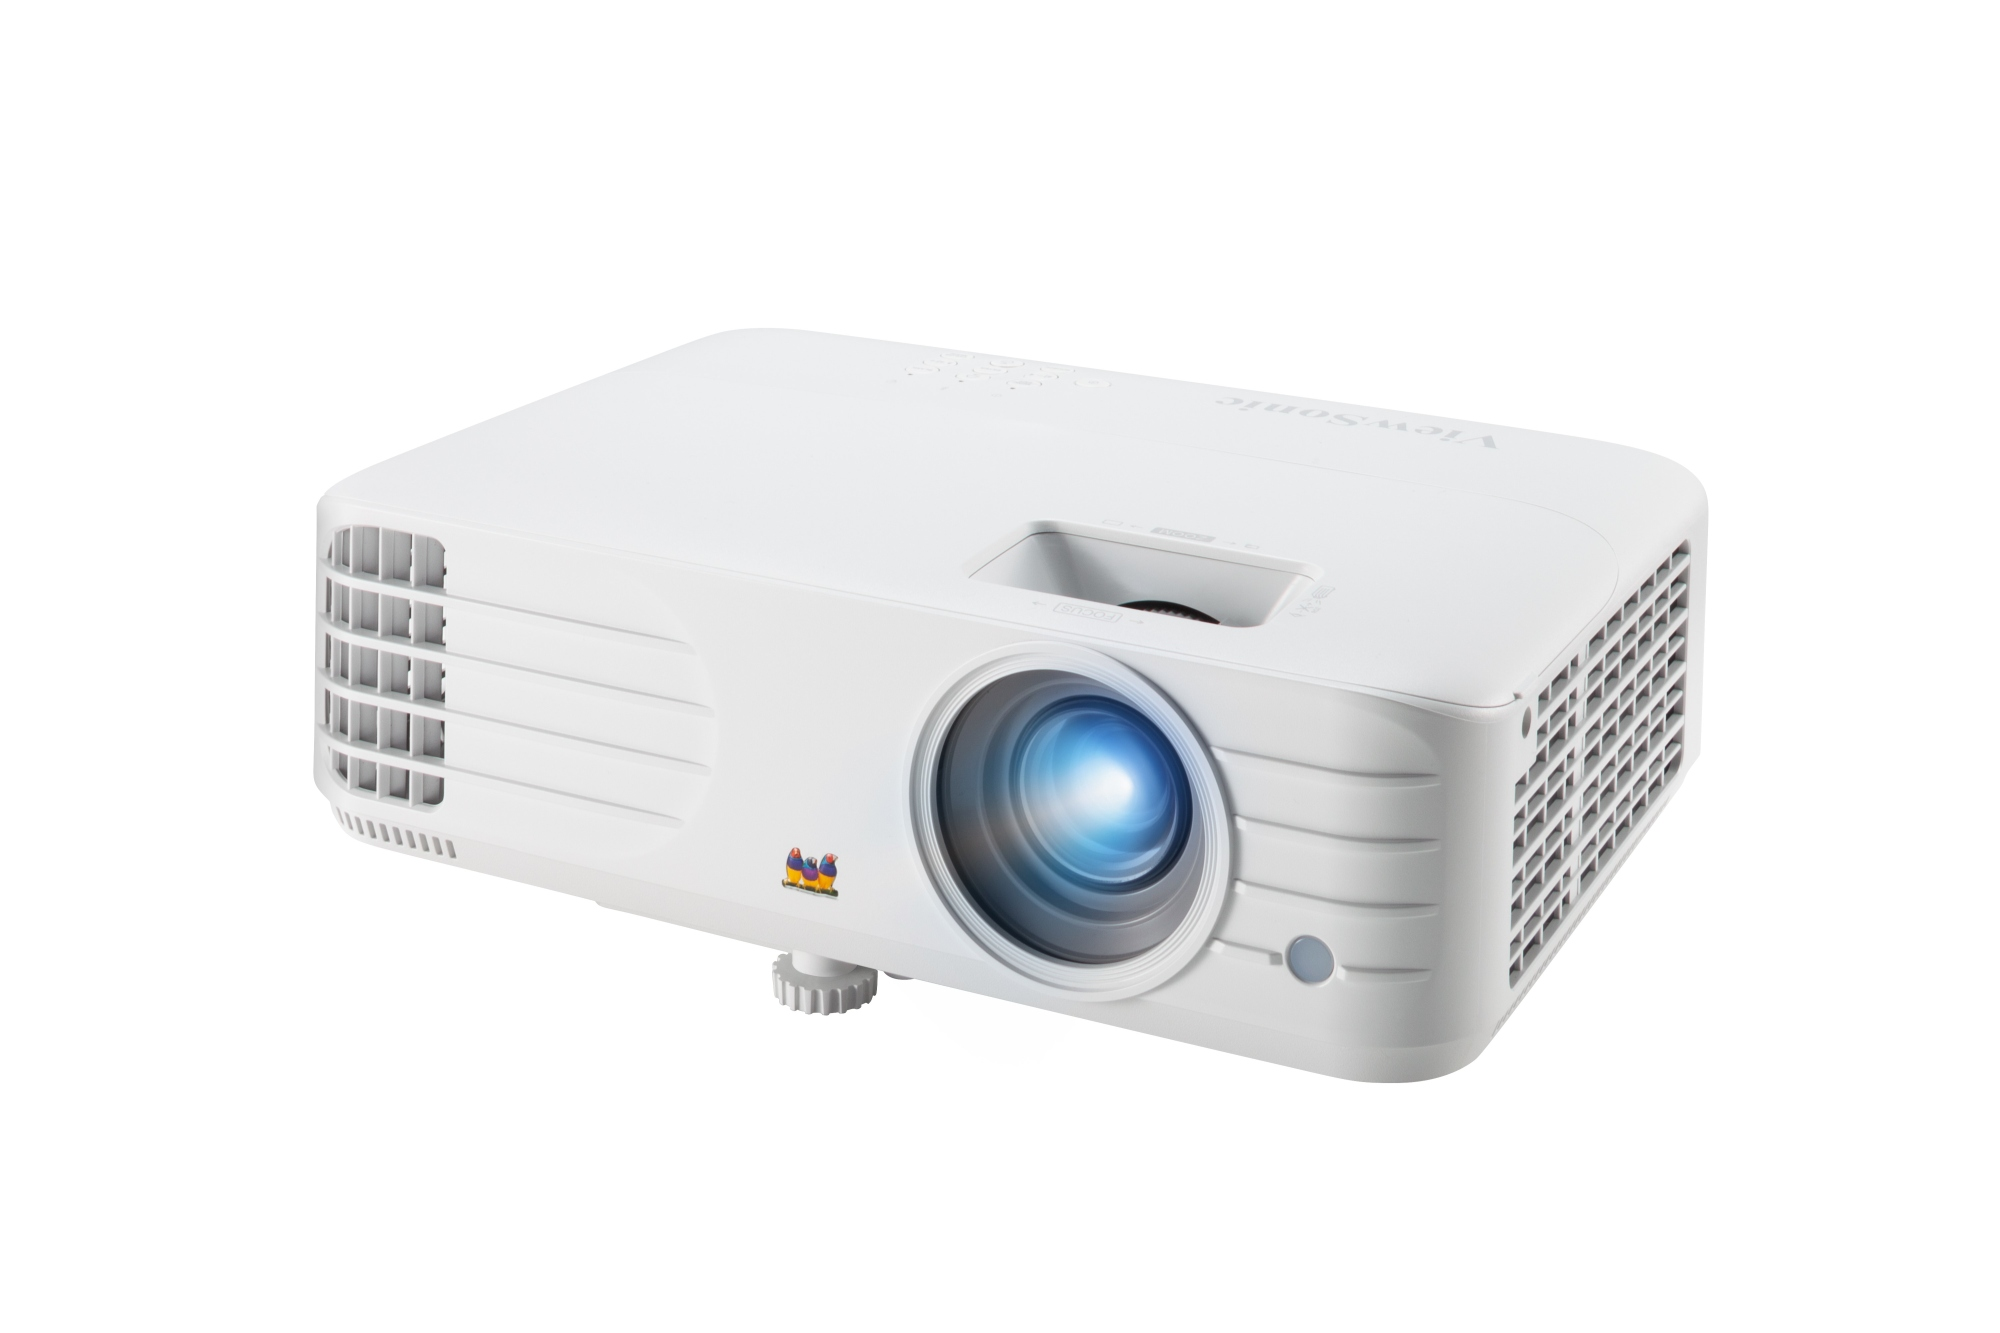 PX701HD VIDEOPROYECTOR 3500 LúMENES ANSI DMD 1080P (1920X1080) 3D PROYECTOR PARA ESCRITORIO BLANCO